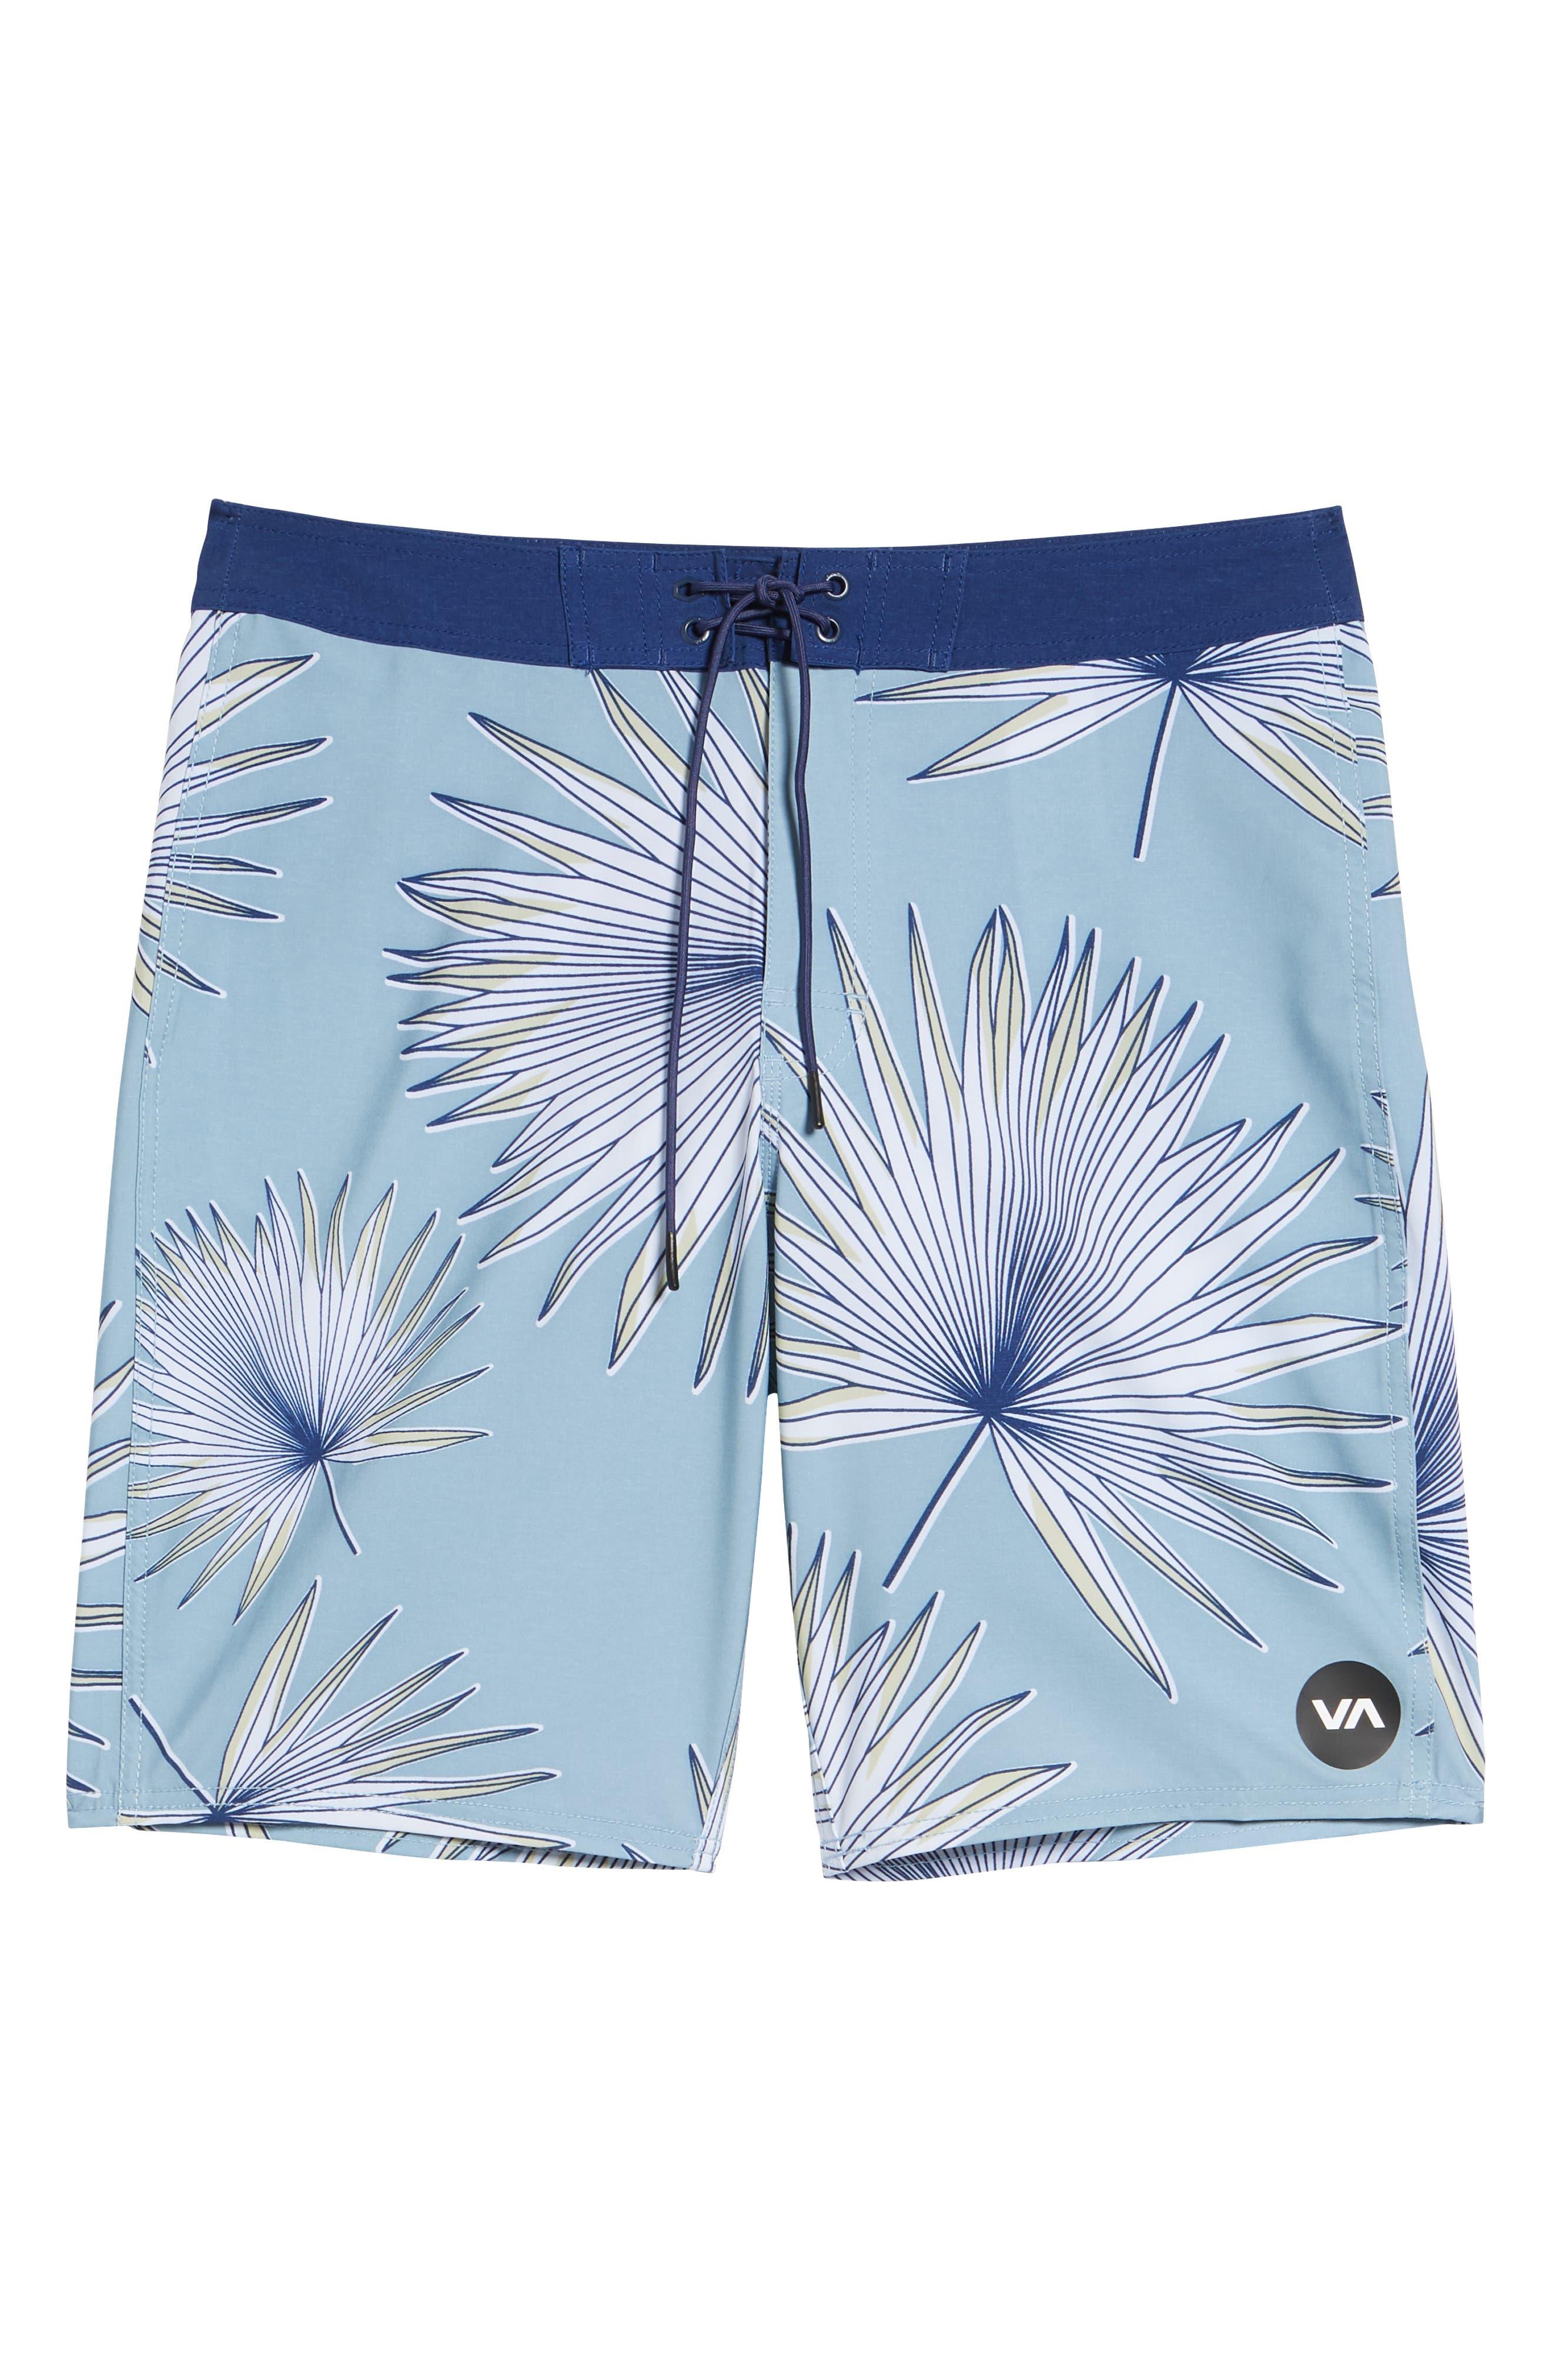 RVCA,                             Varca Board Shorts,                             Alternate thumbnail 6, color,                             478